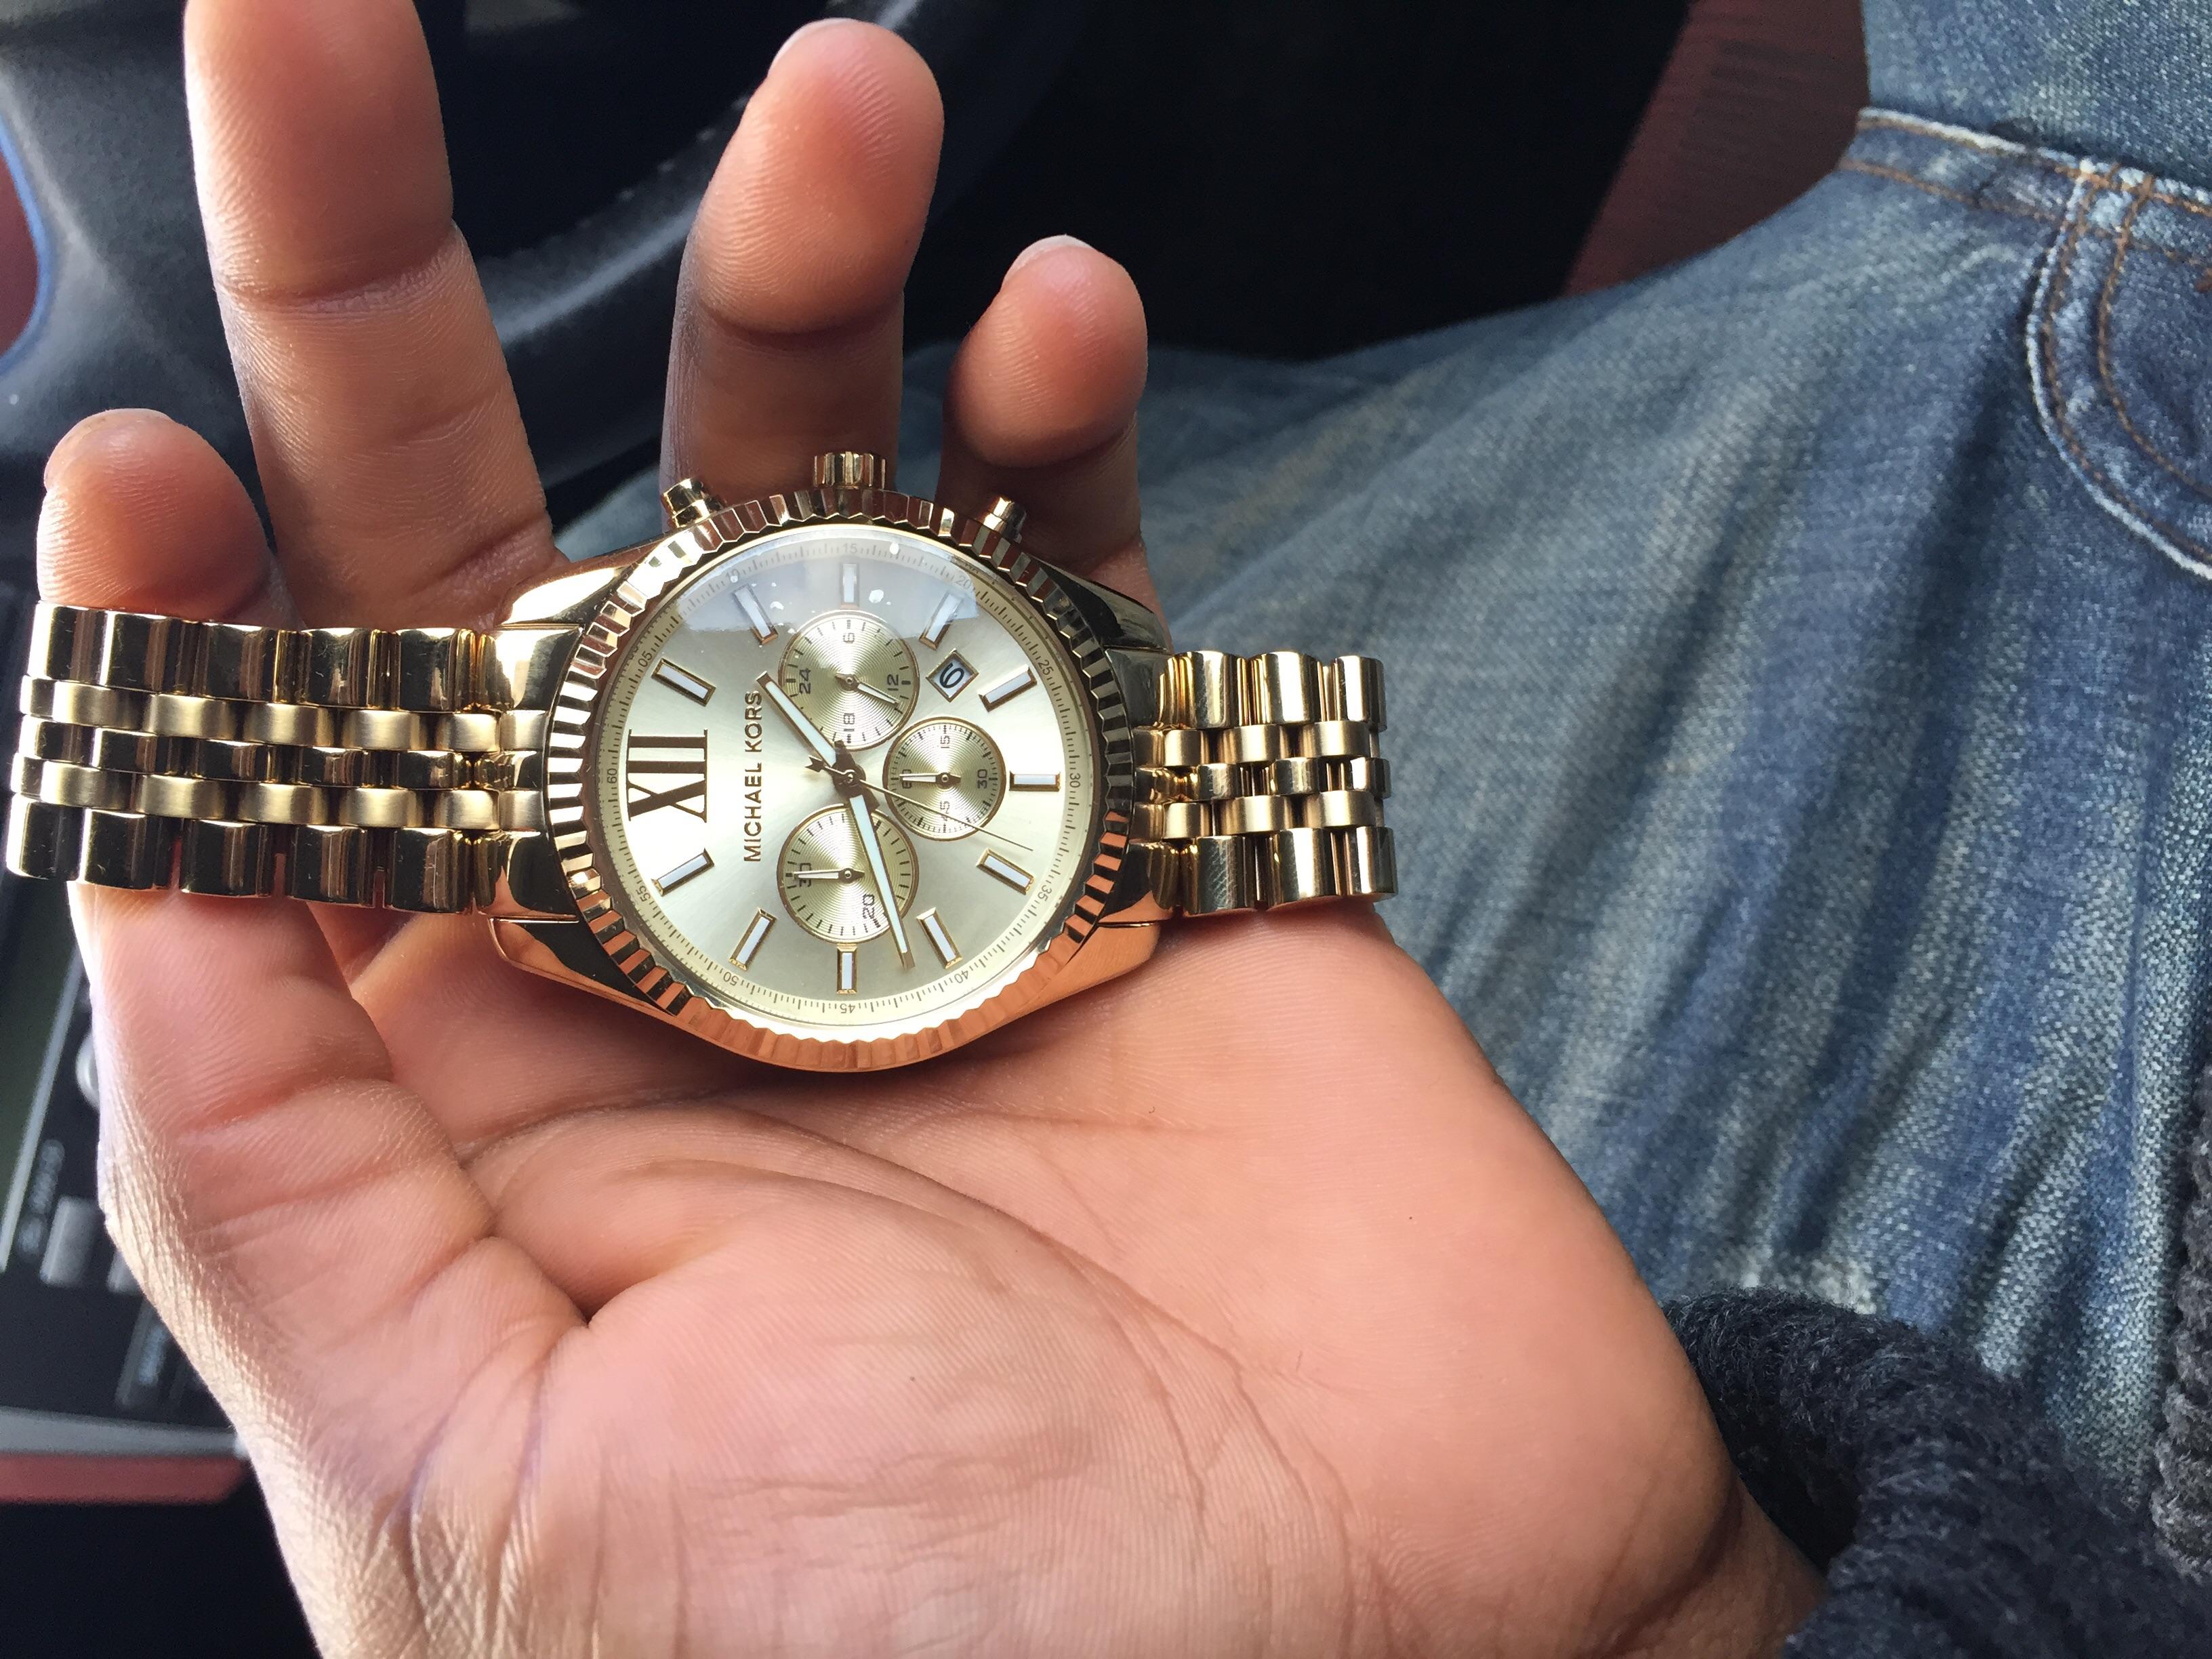 da44d4a498cd Gents Michael Kors Lexington Chronograph Watch (MK8281)